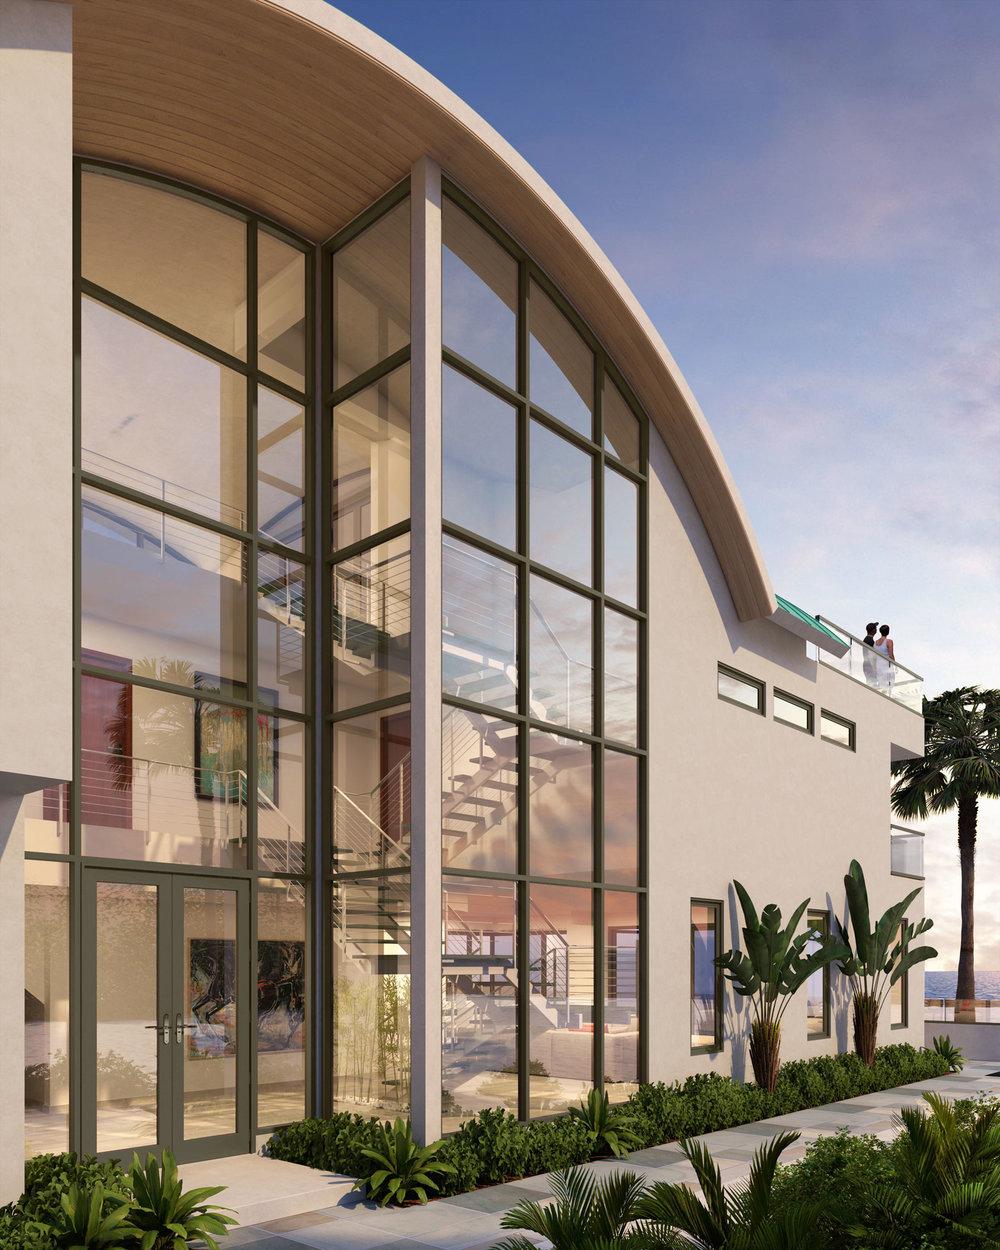 Newport Beach - Contemporary Beach House Exterior by Oatman Architects